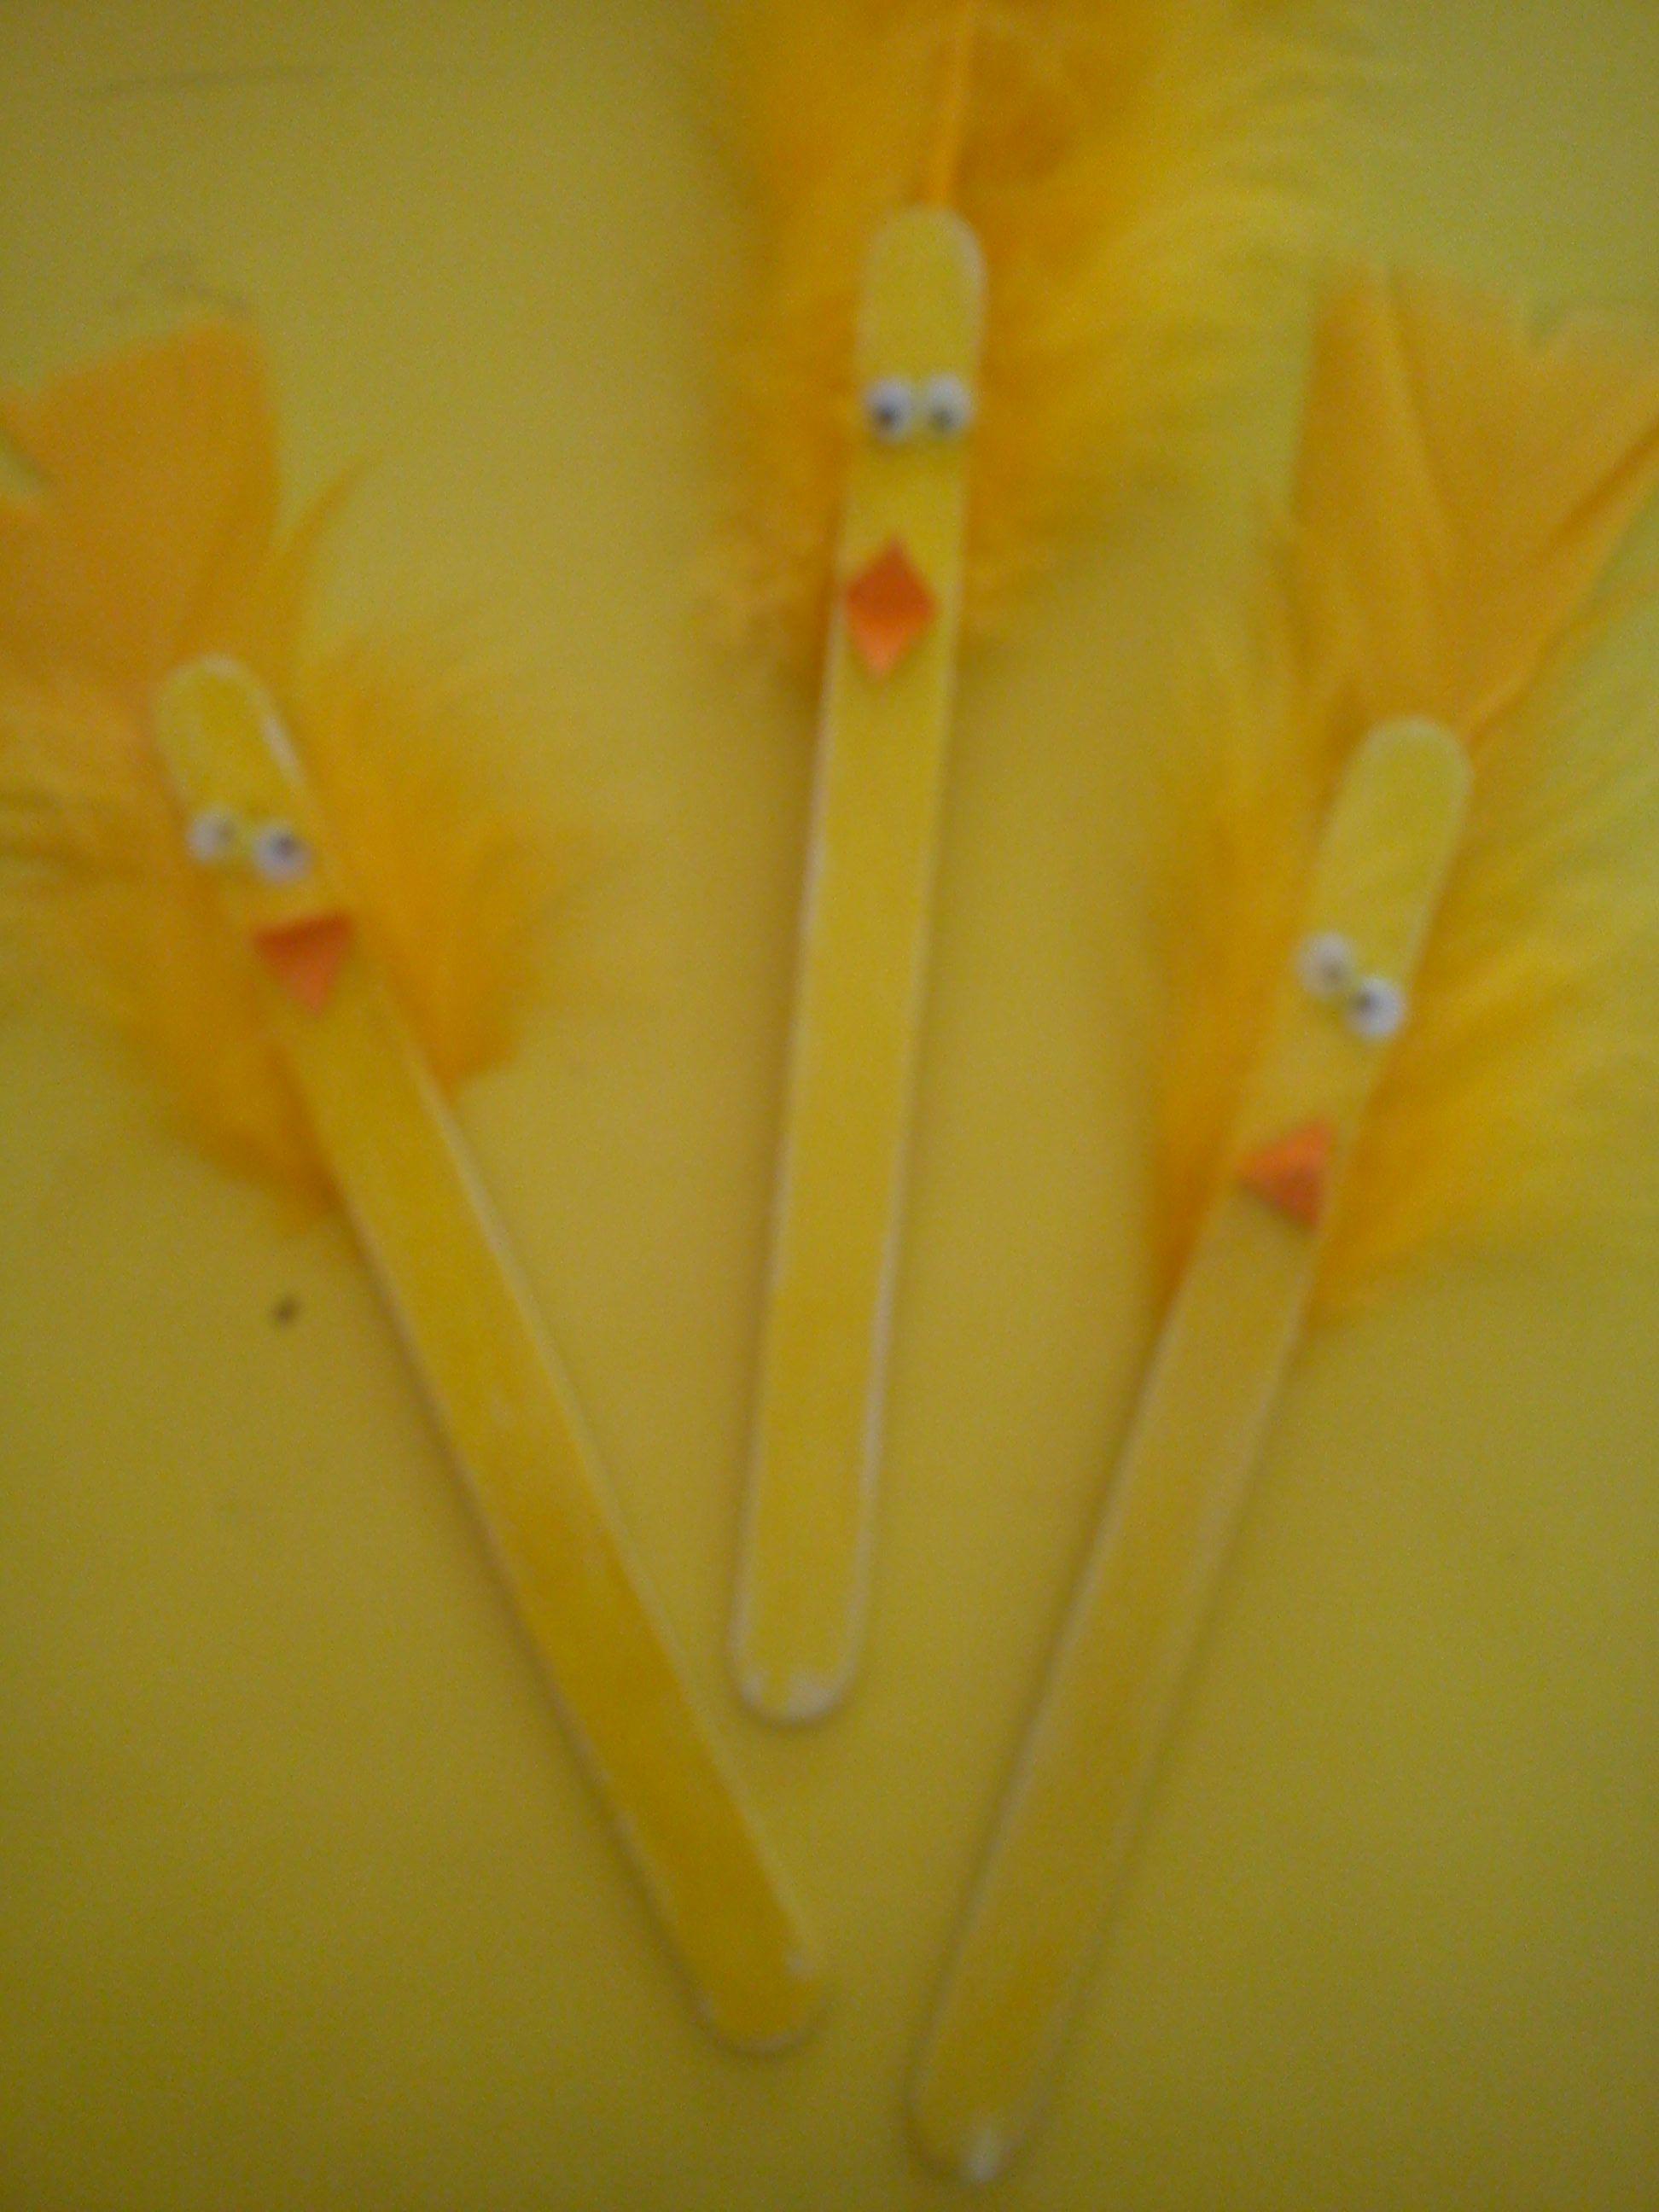 Super Simple Craft Stick Ducks Idea From Activity